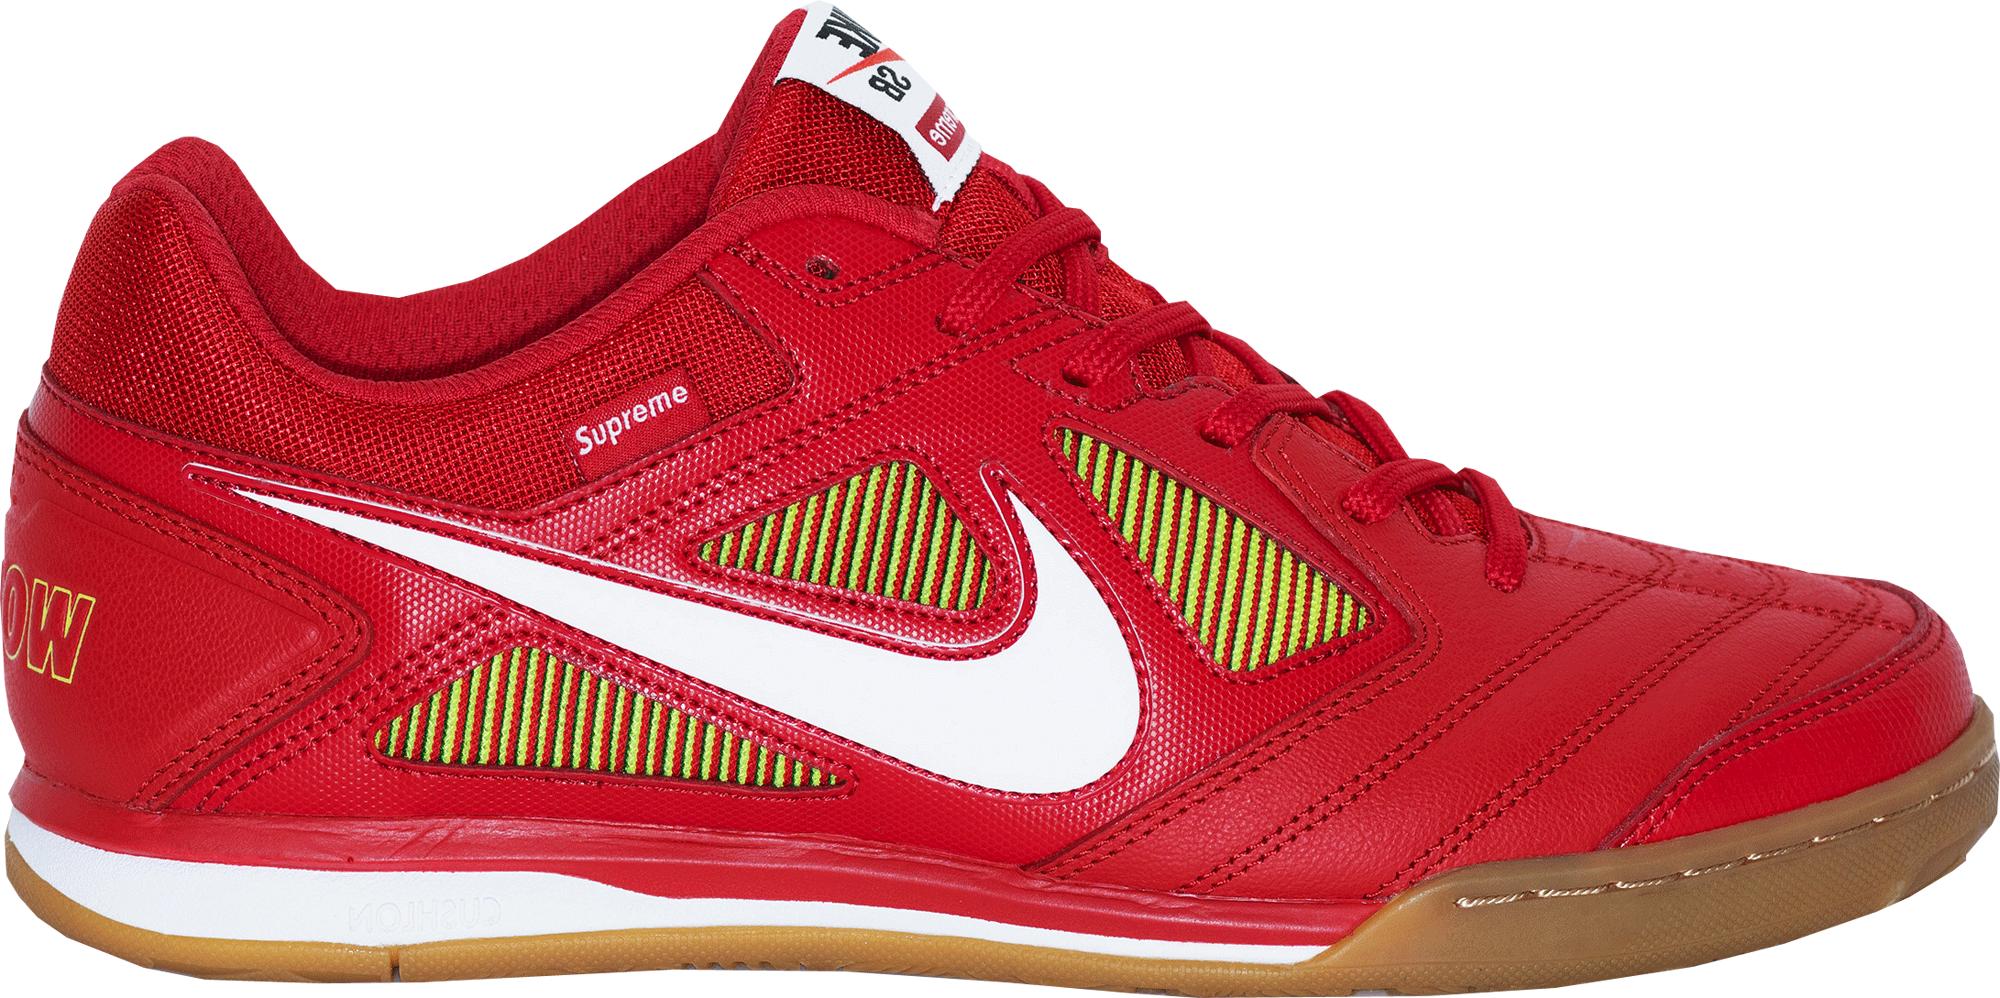 d3033515b Supreme Nike SB Gato Red - StockX News